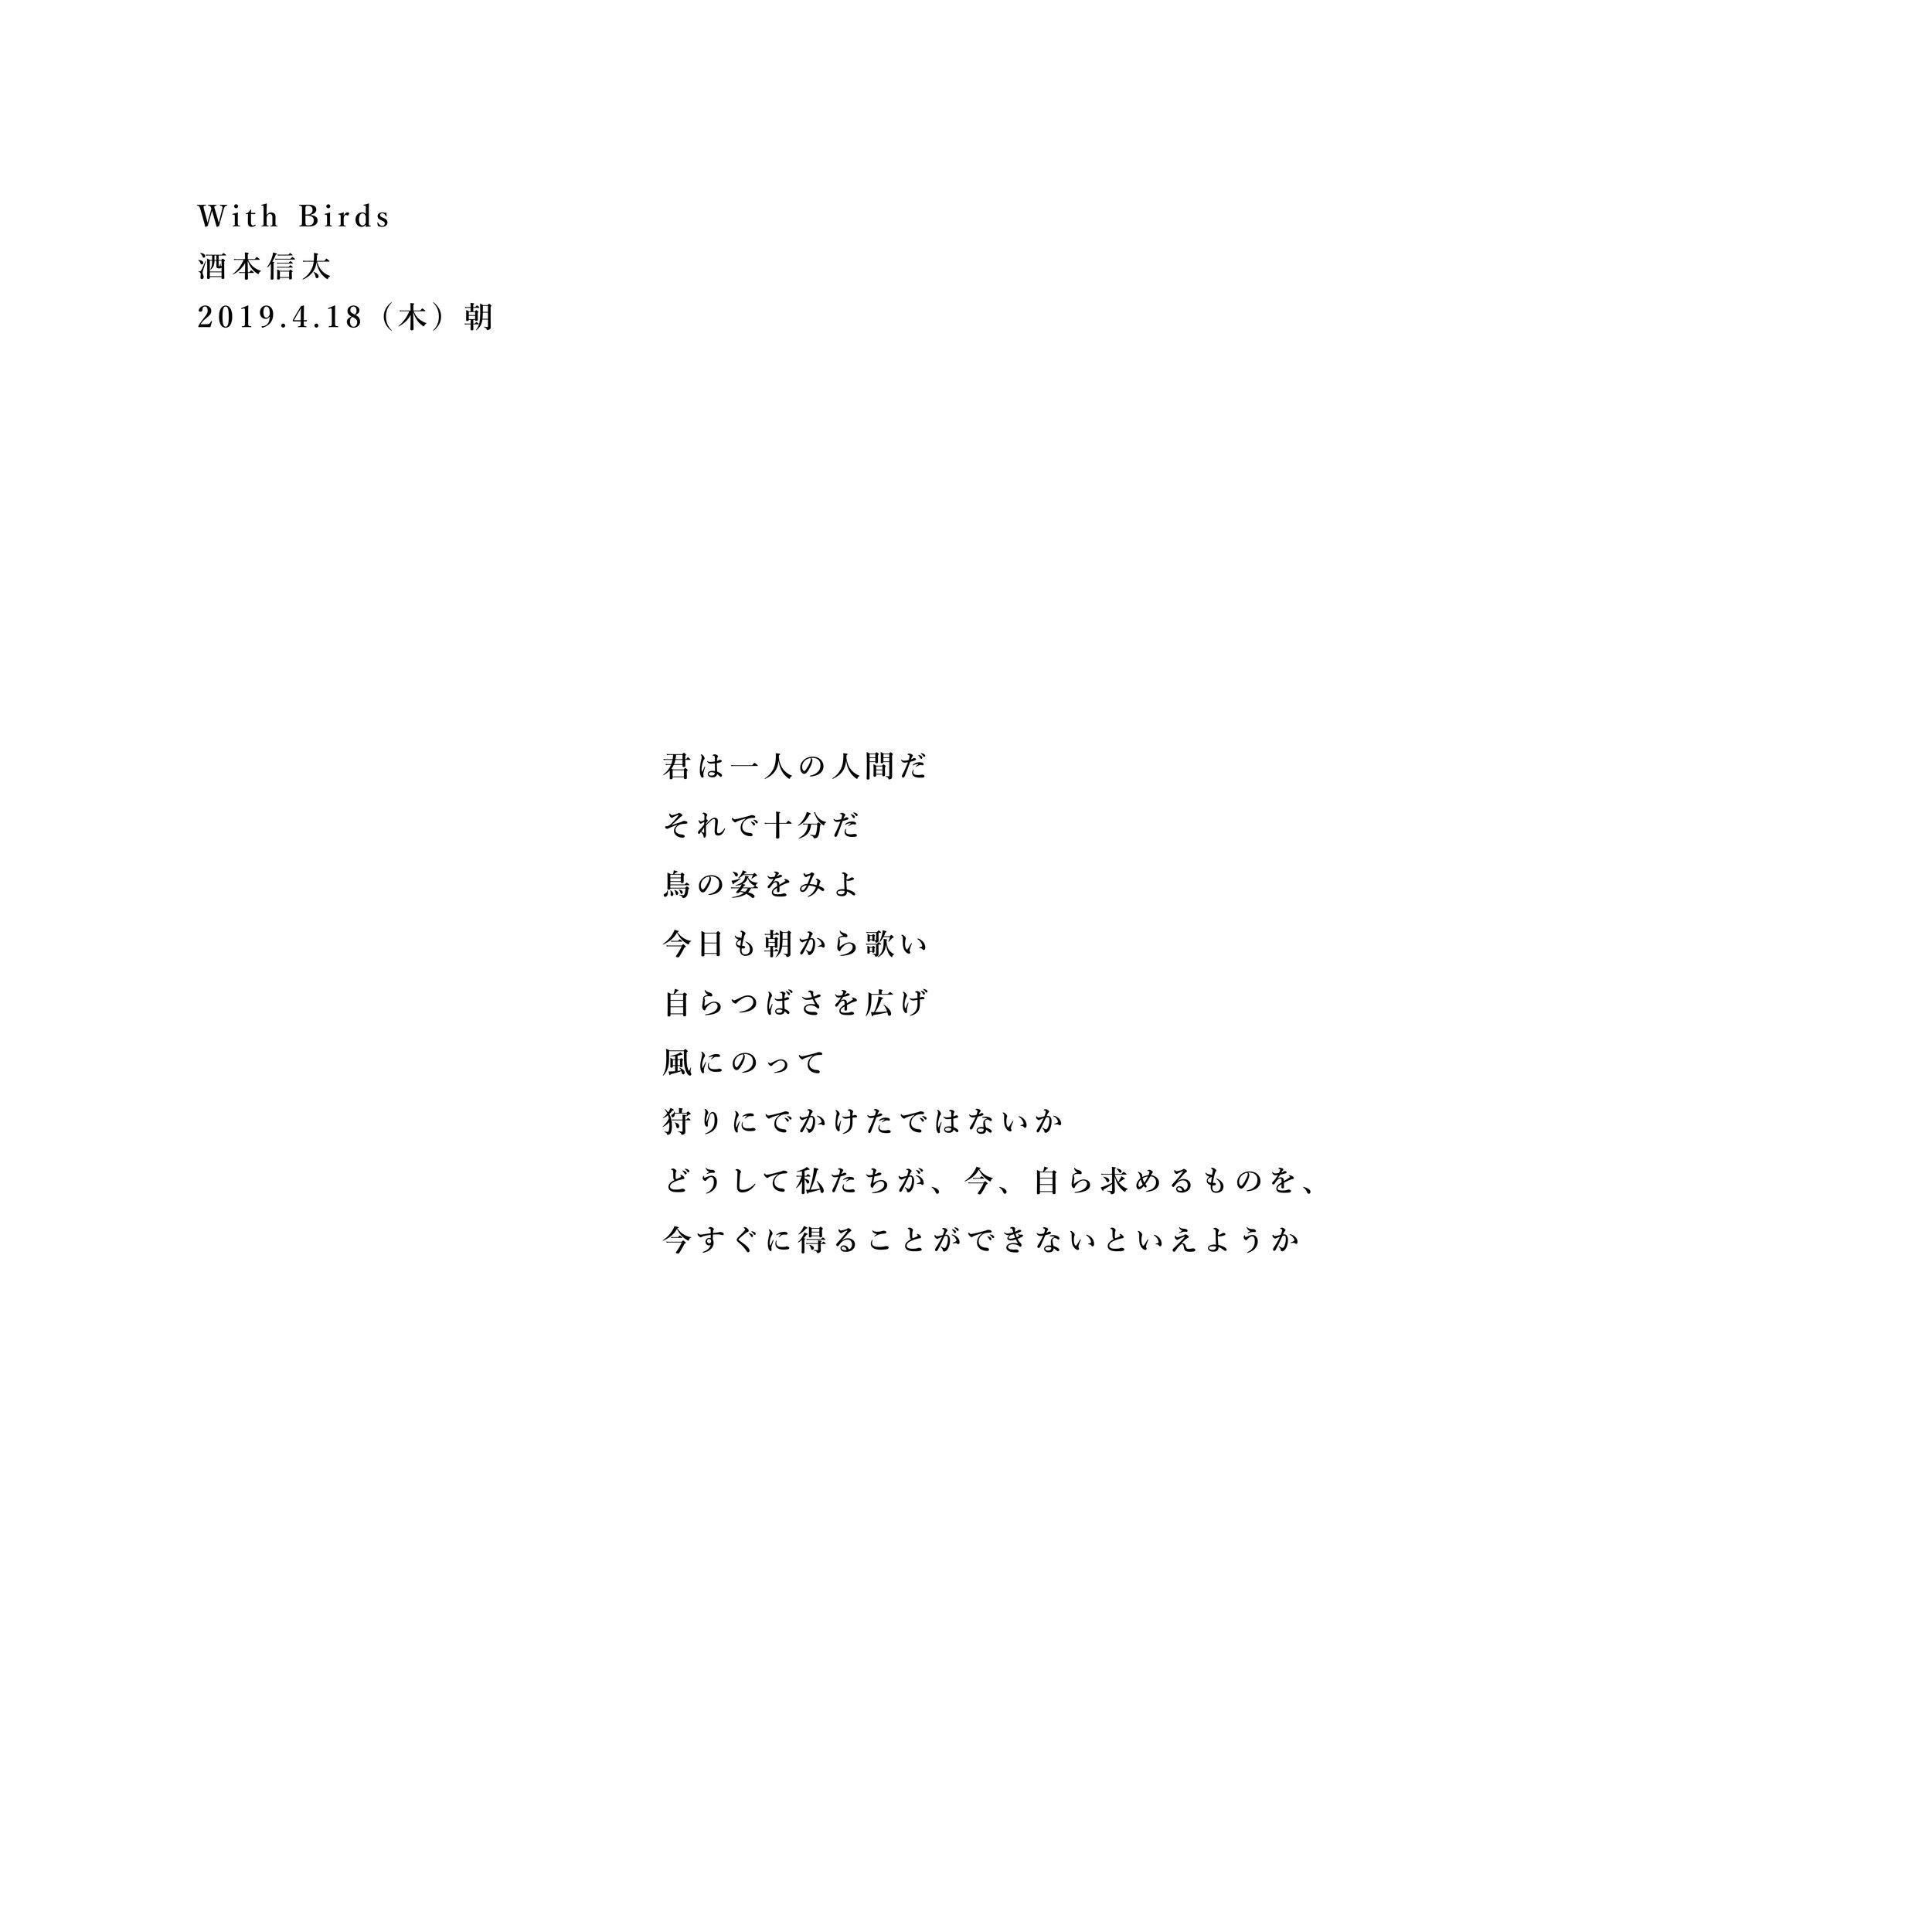 With Birds テキスト集.001.jpeg